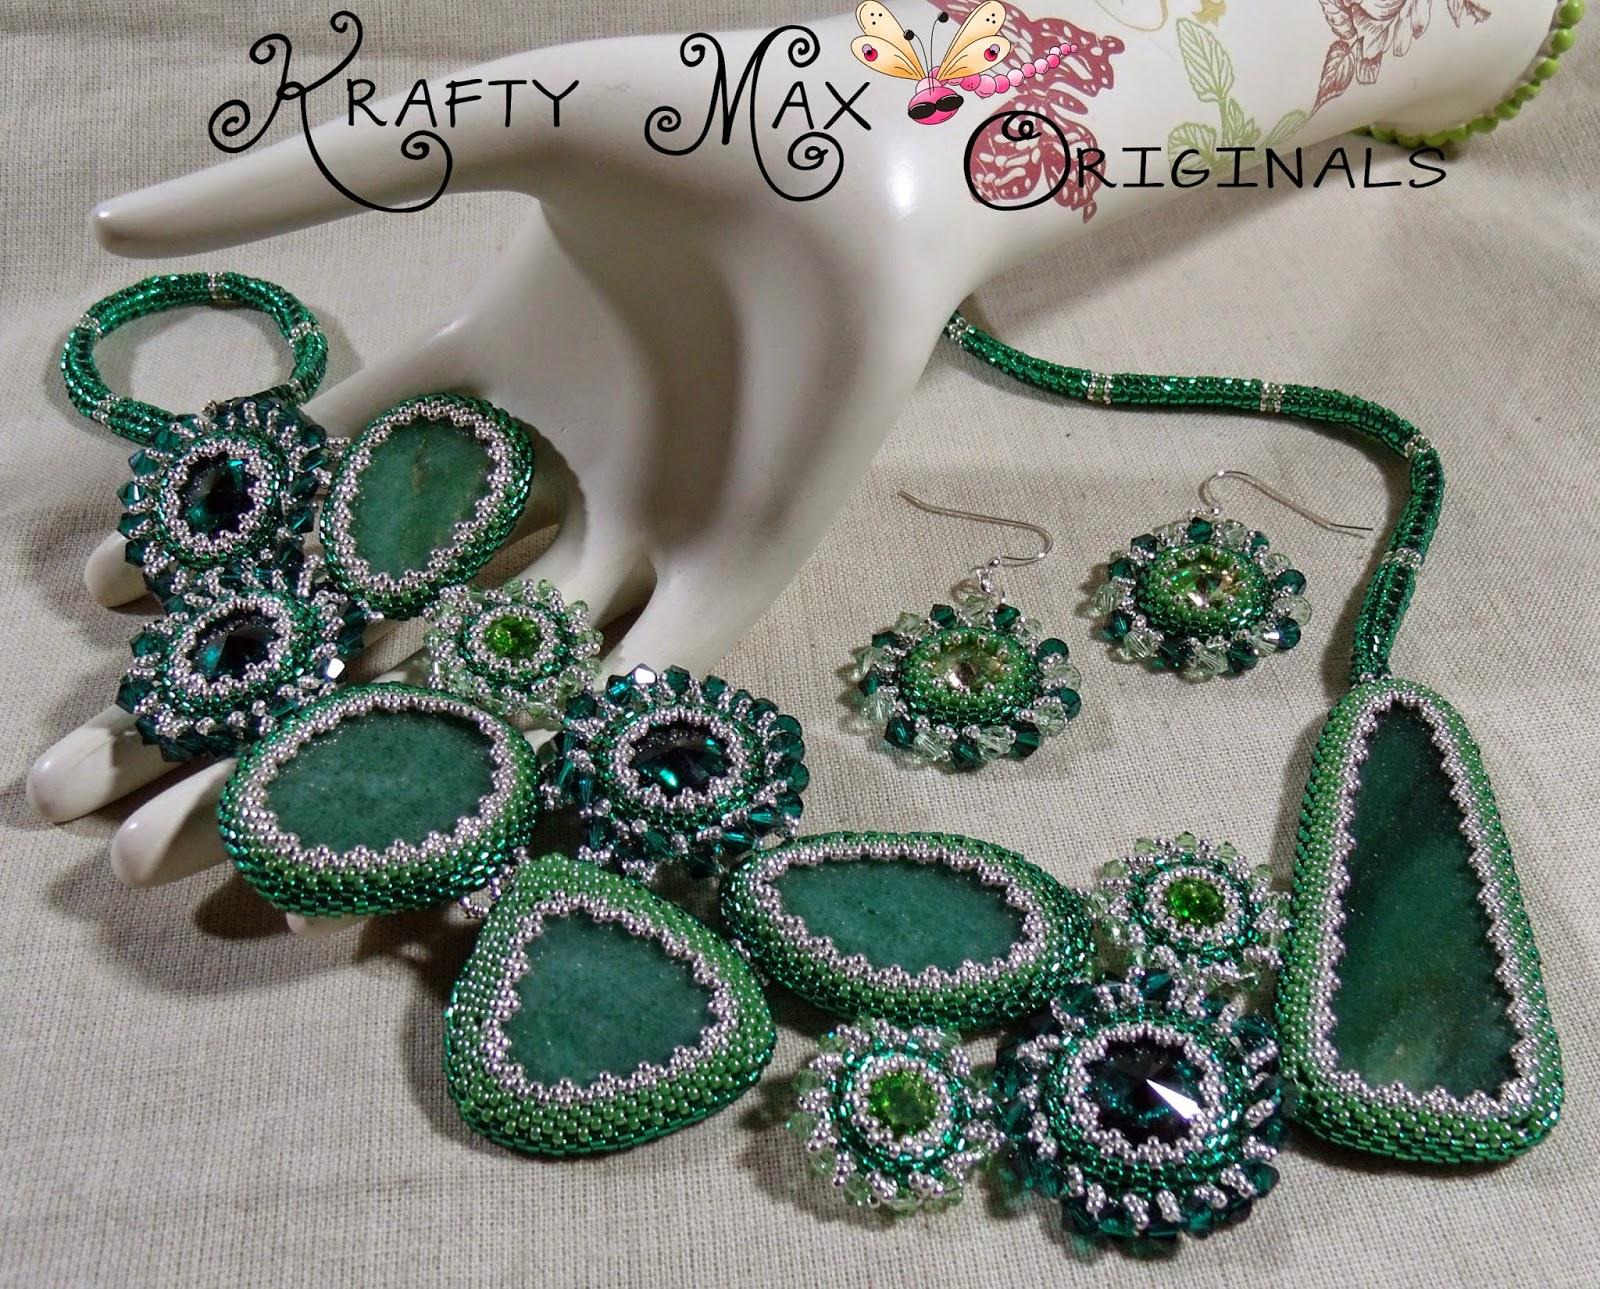 http://www.artfire.com/ext/shop/product_view/10271305